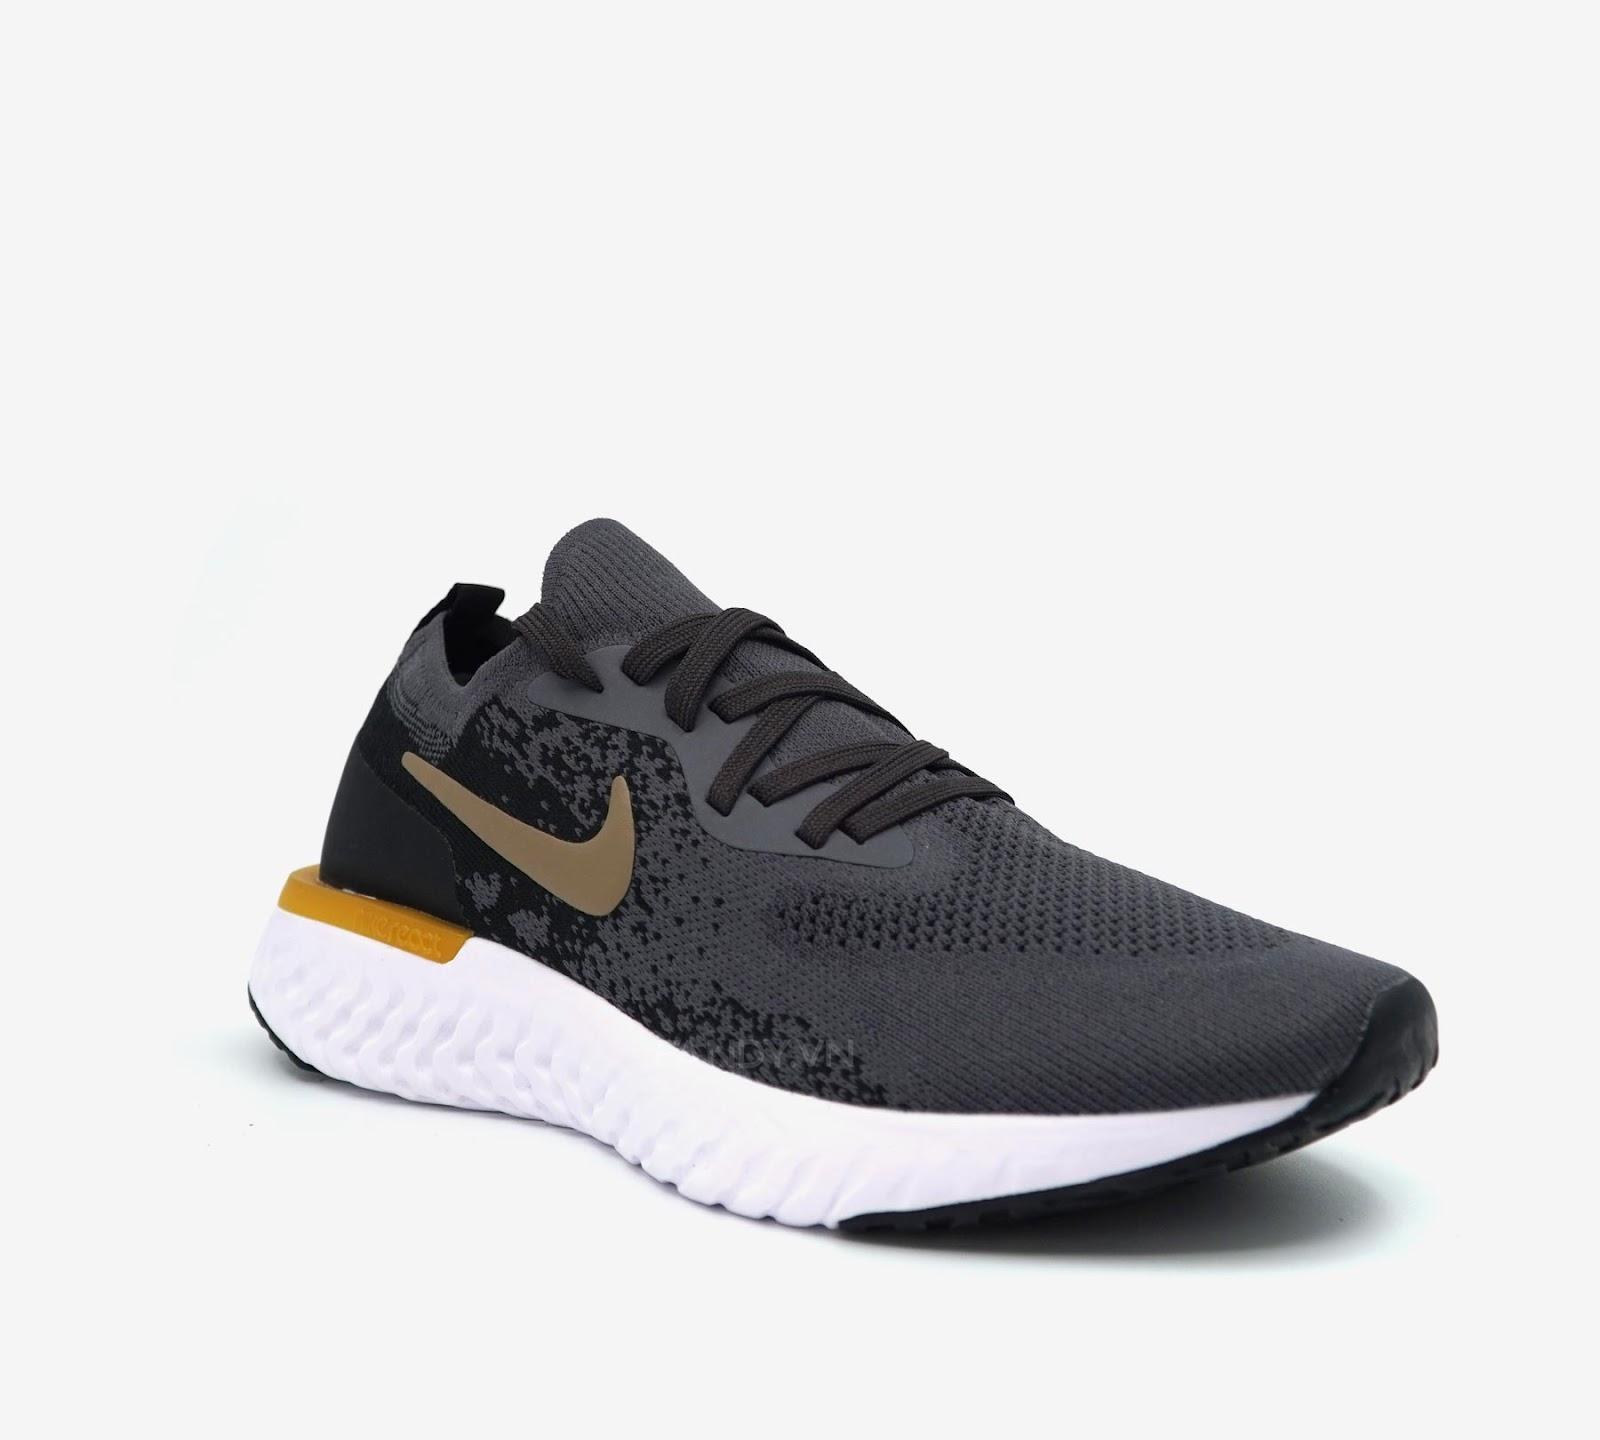 Giày Nike Epic React Flyknit  Grey/Black Gold